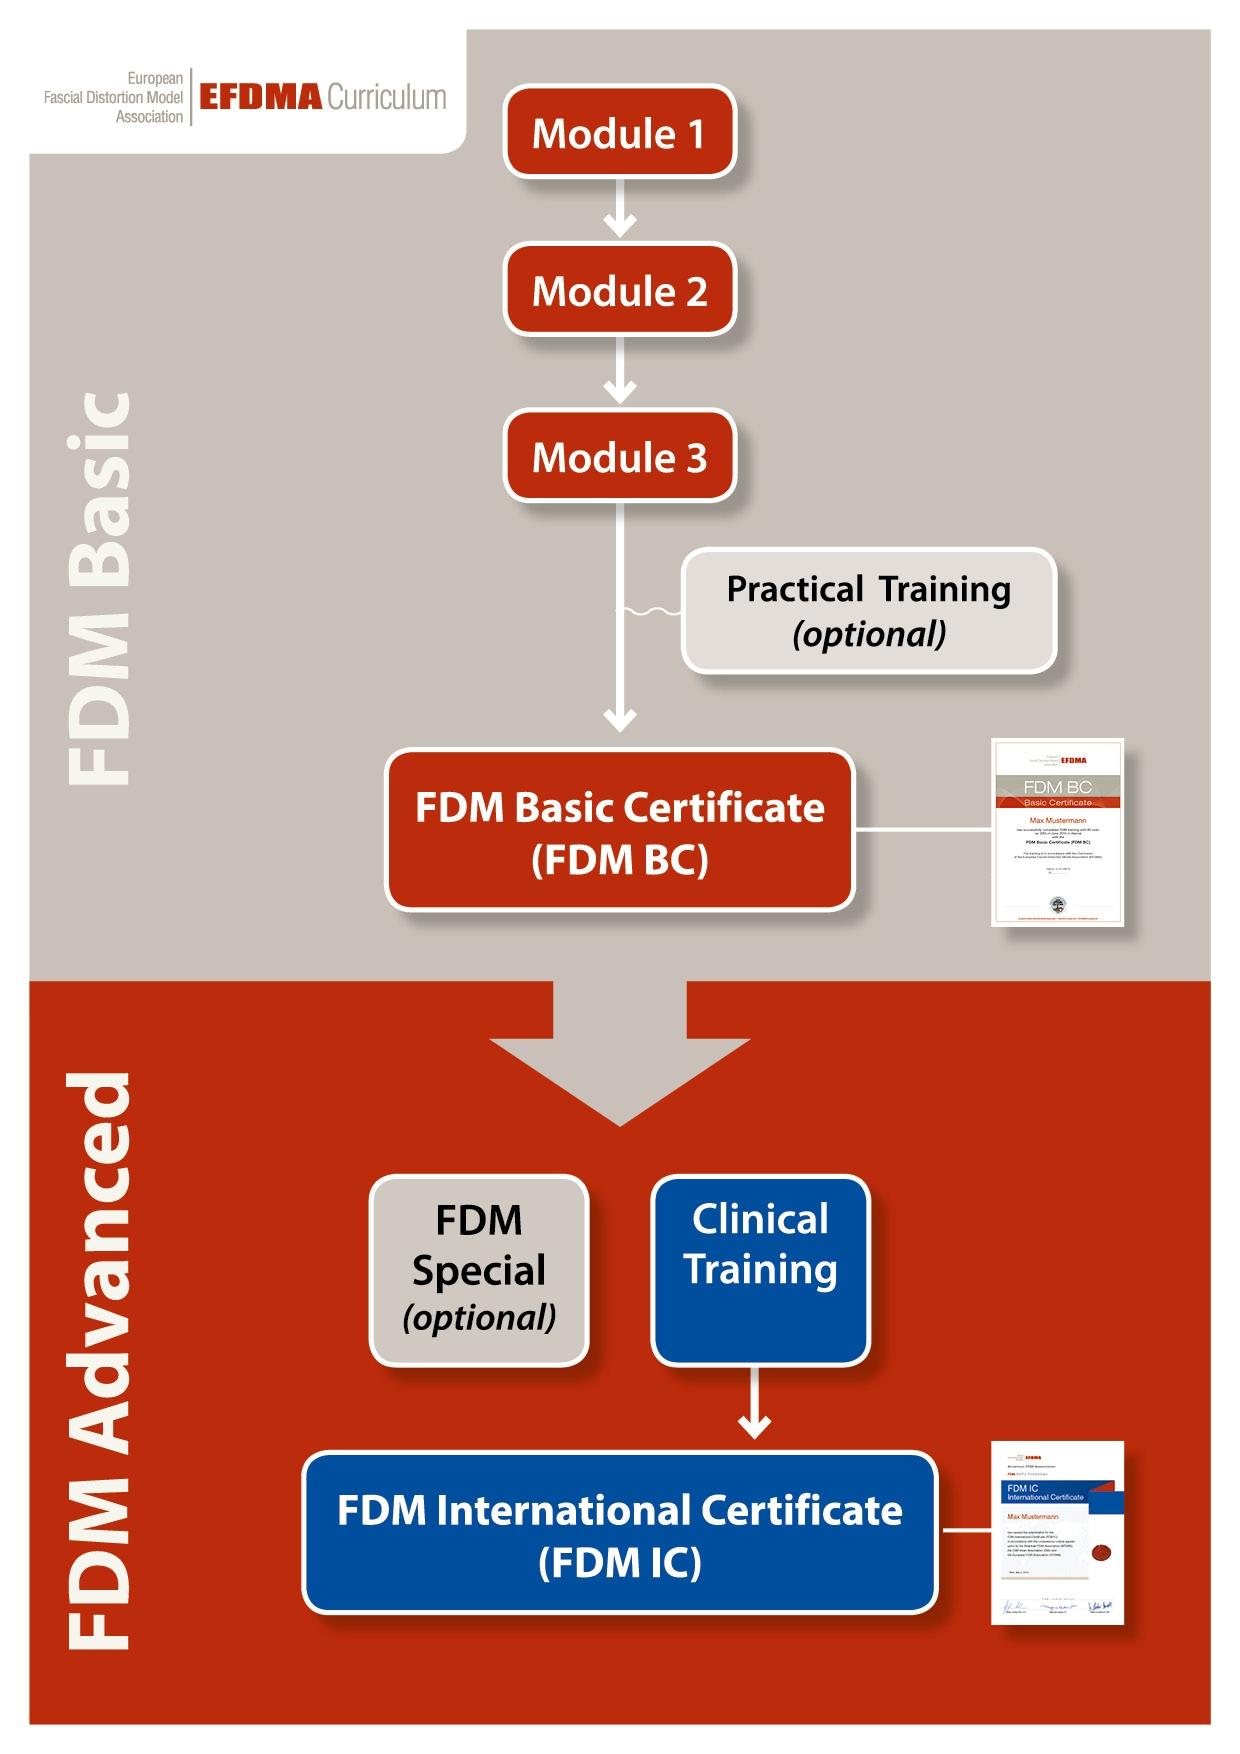 EFDMA Curriculum chart